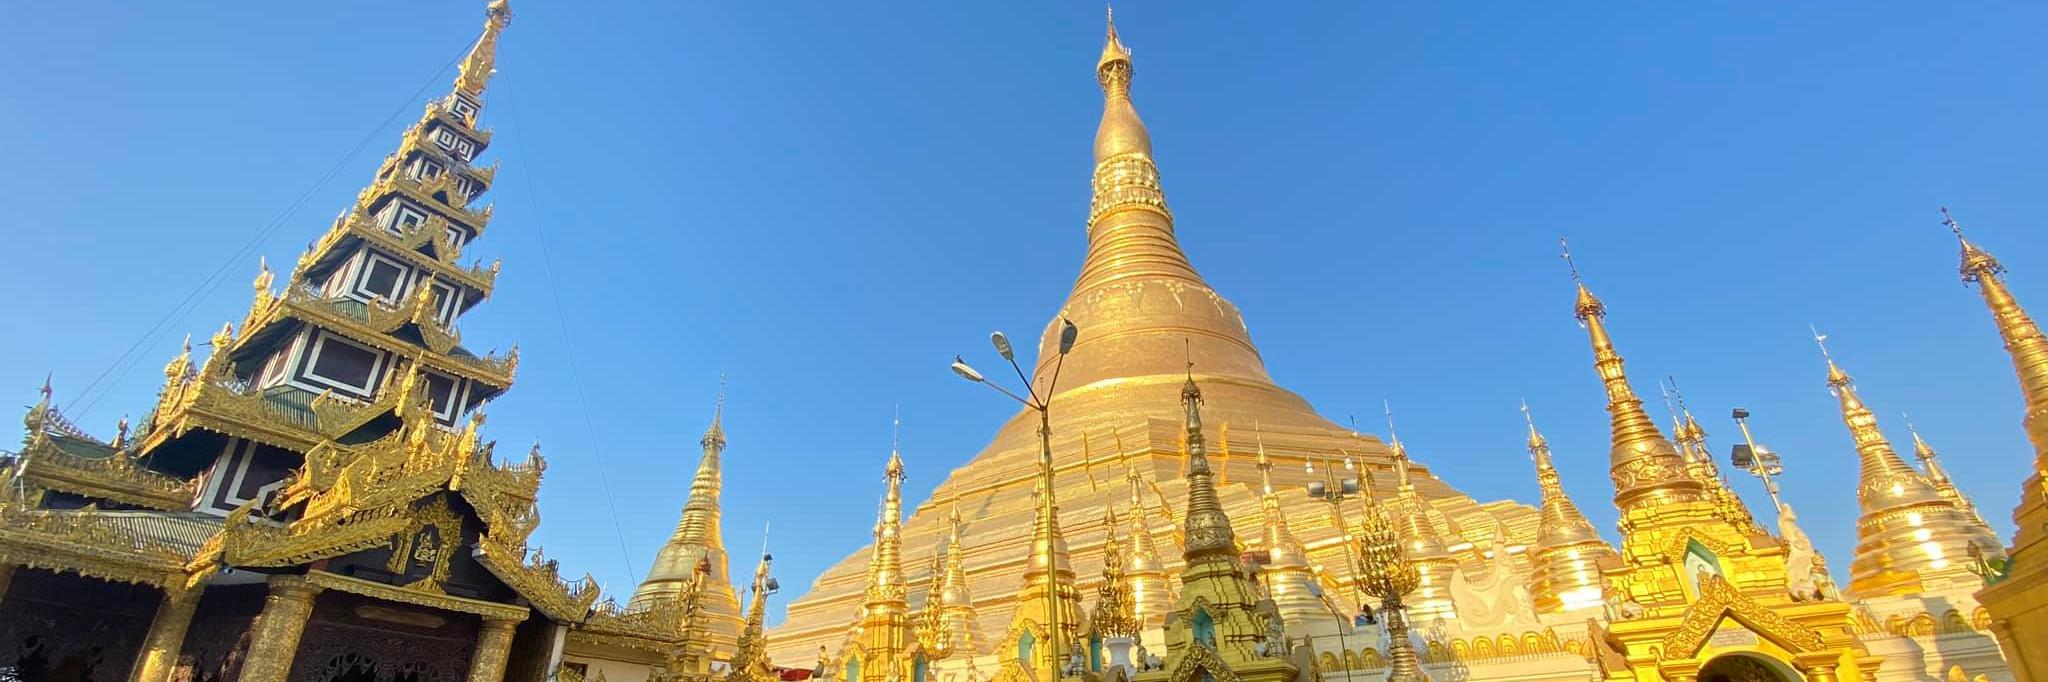 https://gody.vn/blog/vickymyta2853041/post/kinh-nghiem-du-lich-myanmar-9119